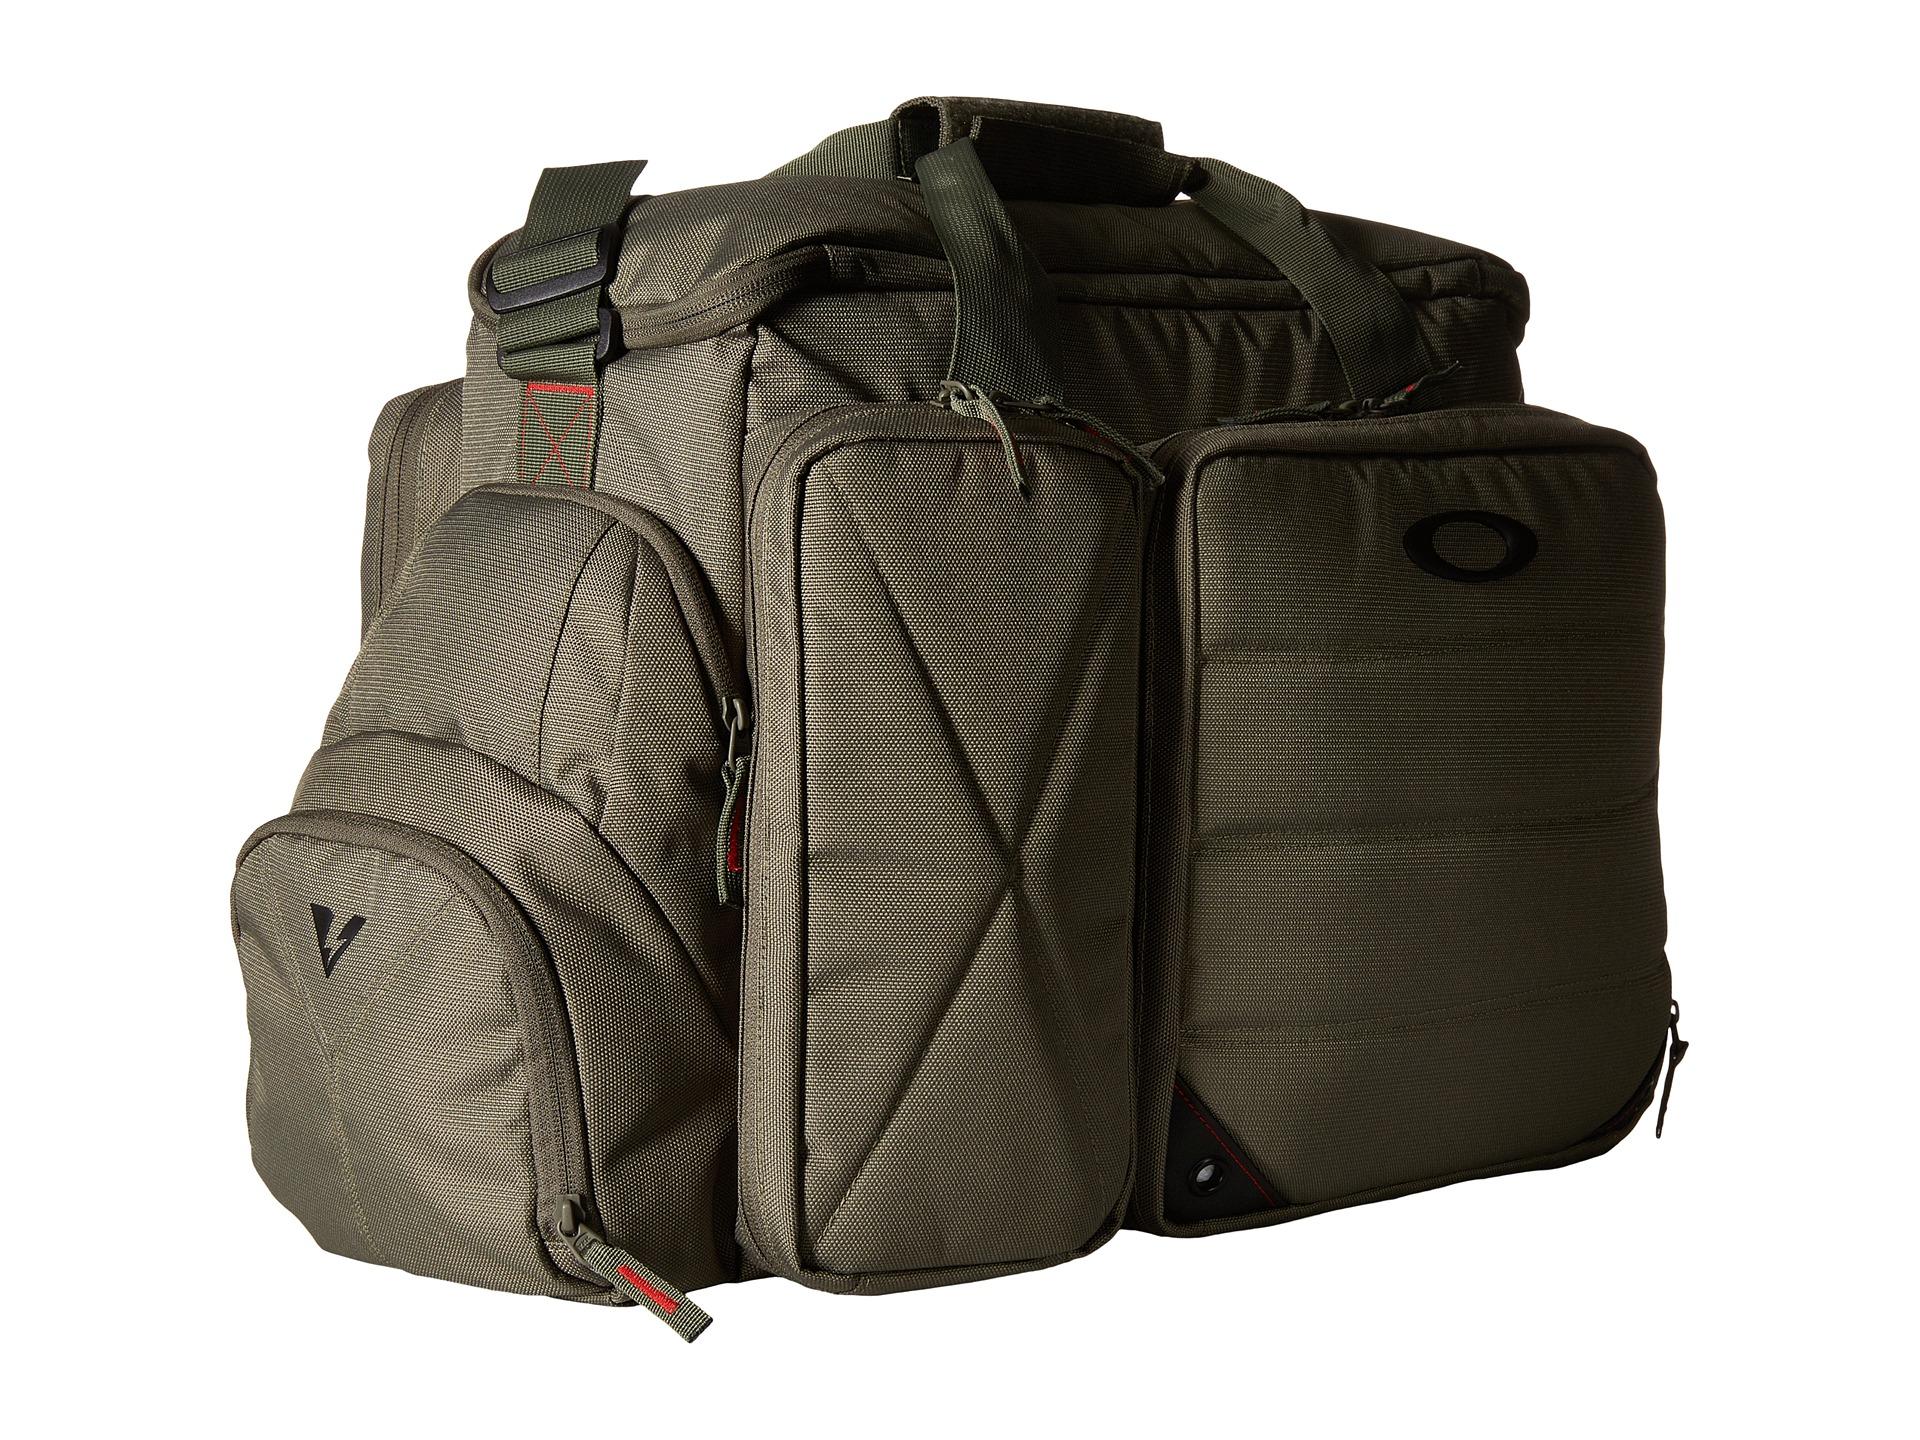 281121fa370 Oakley Gun Range Bag